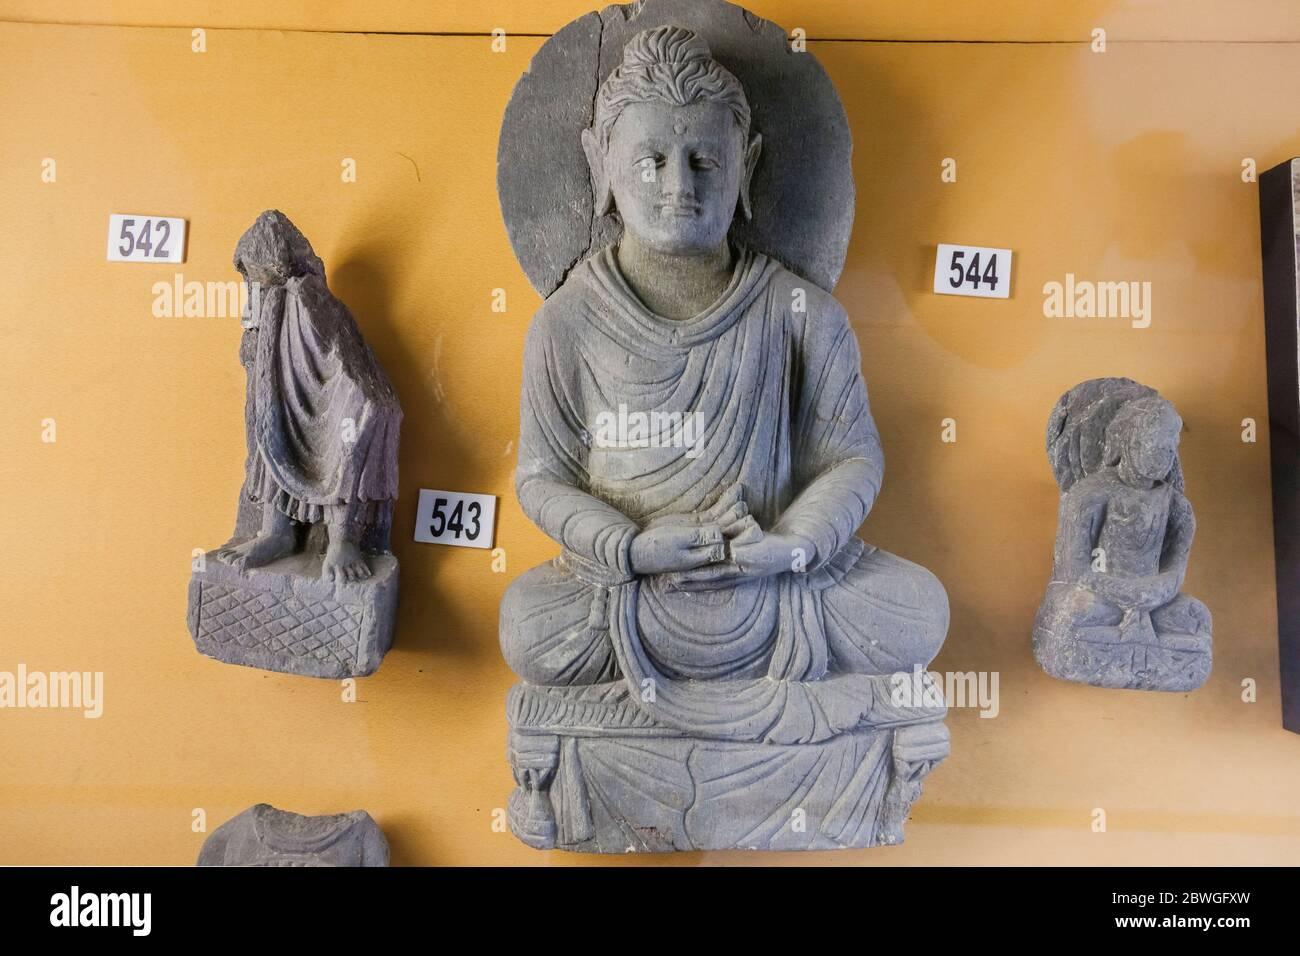 Stone Carving Gandhara Buddha Statue Swat Museum Mingora Swat Khyber Pakhtunkhwa Province Pakistan South Asia Asia Stock Photo Alamy